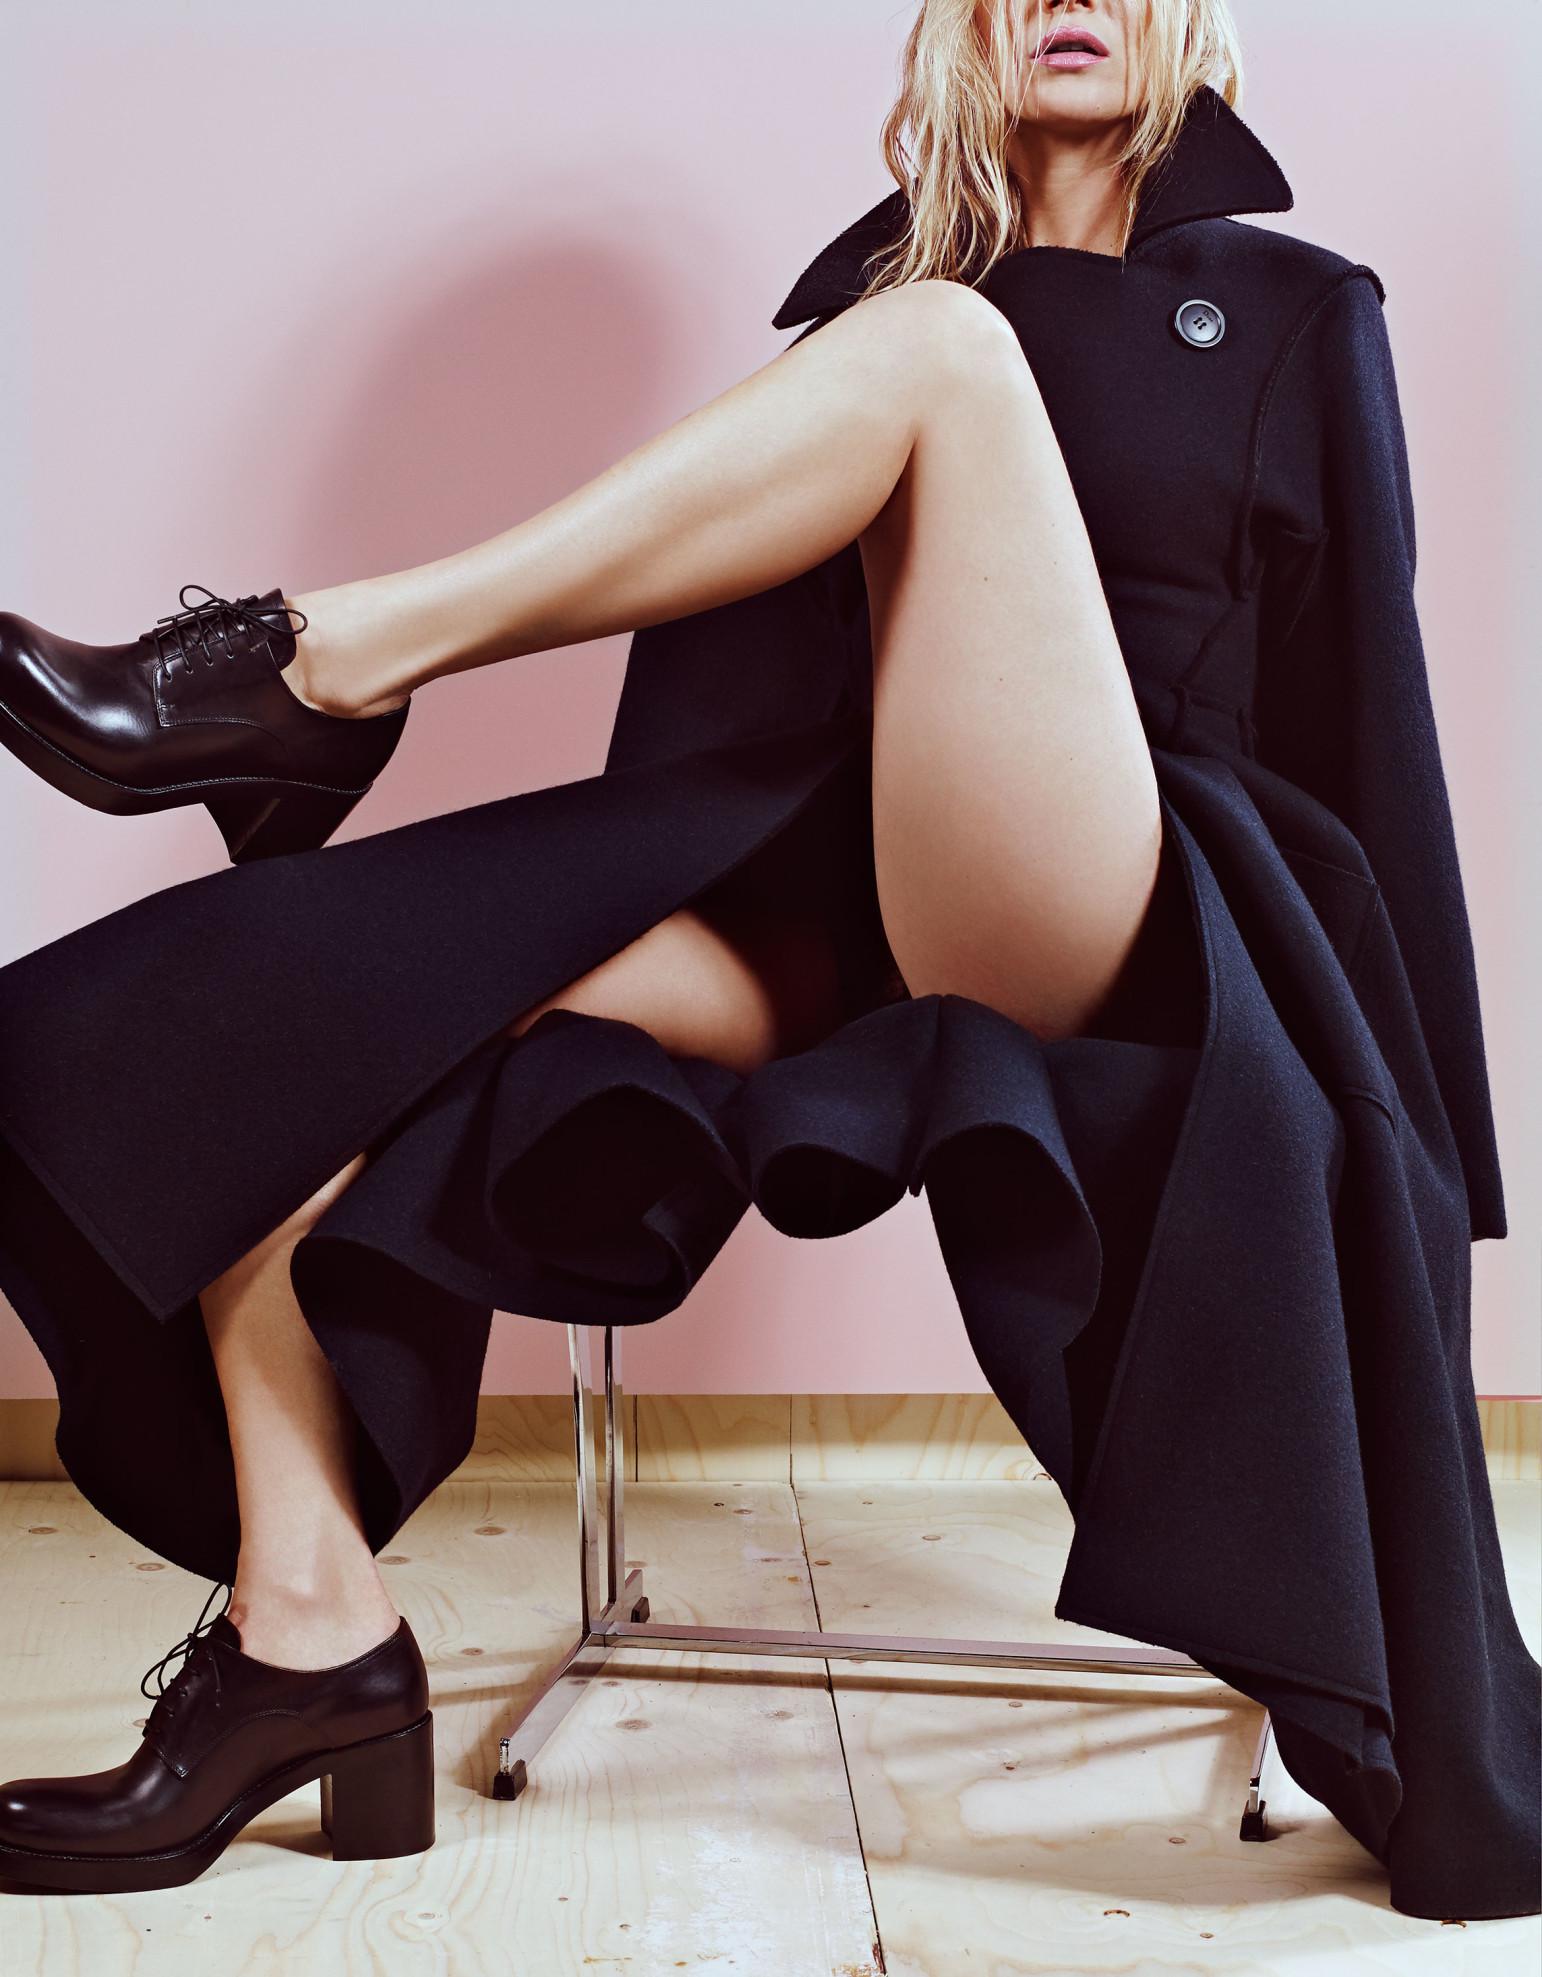 Kate Moss Naked (8 Photos)